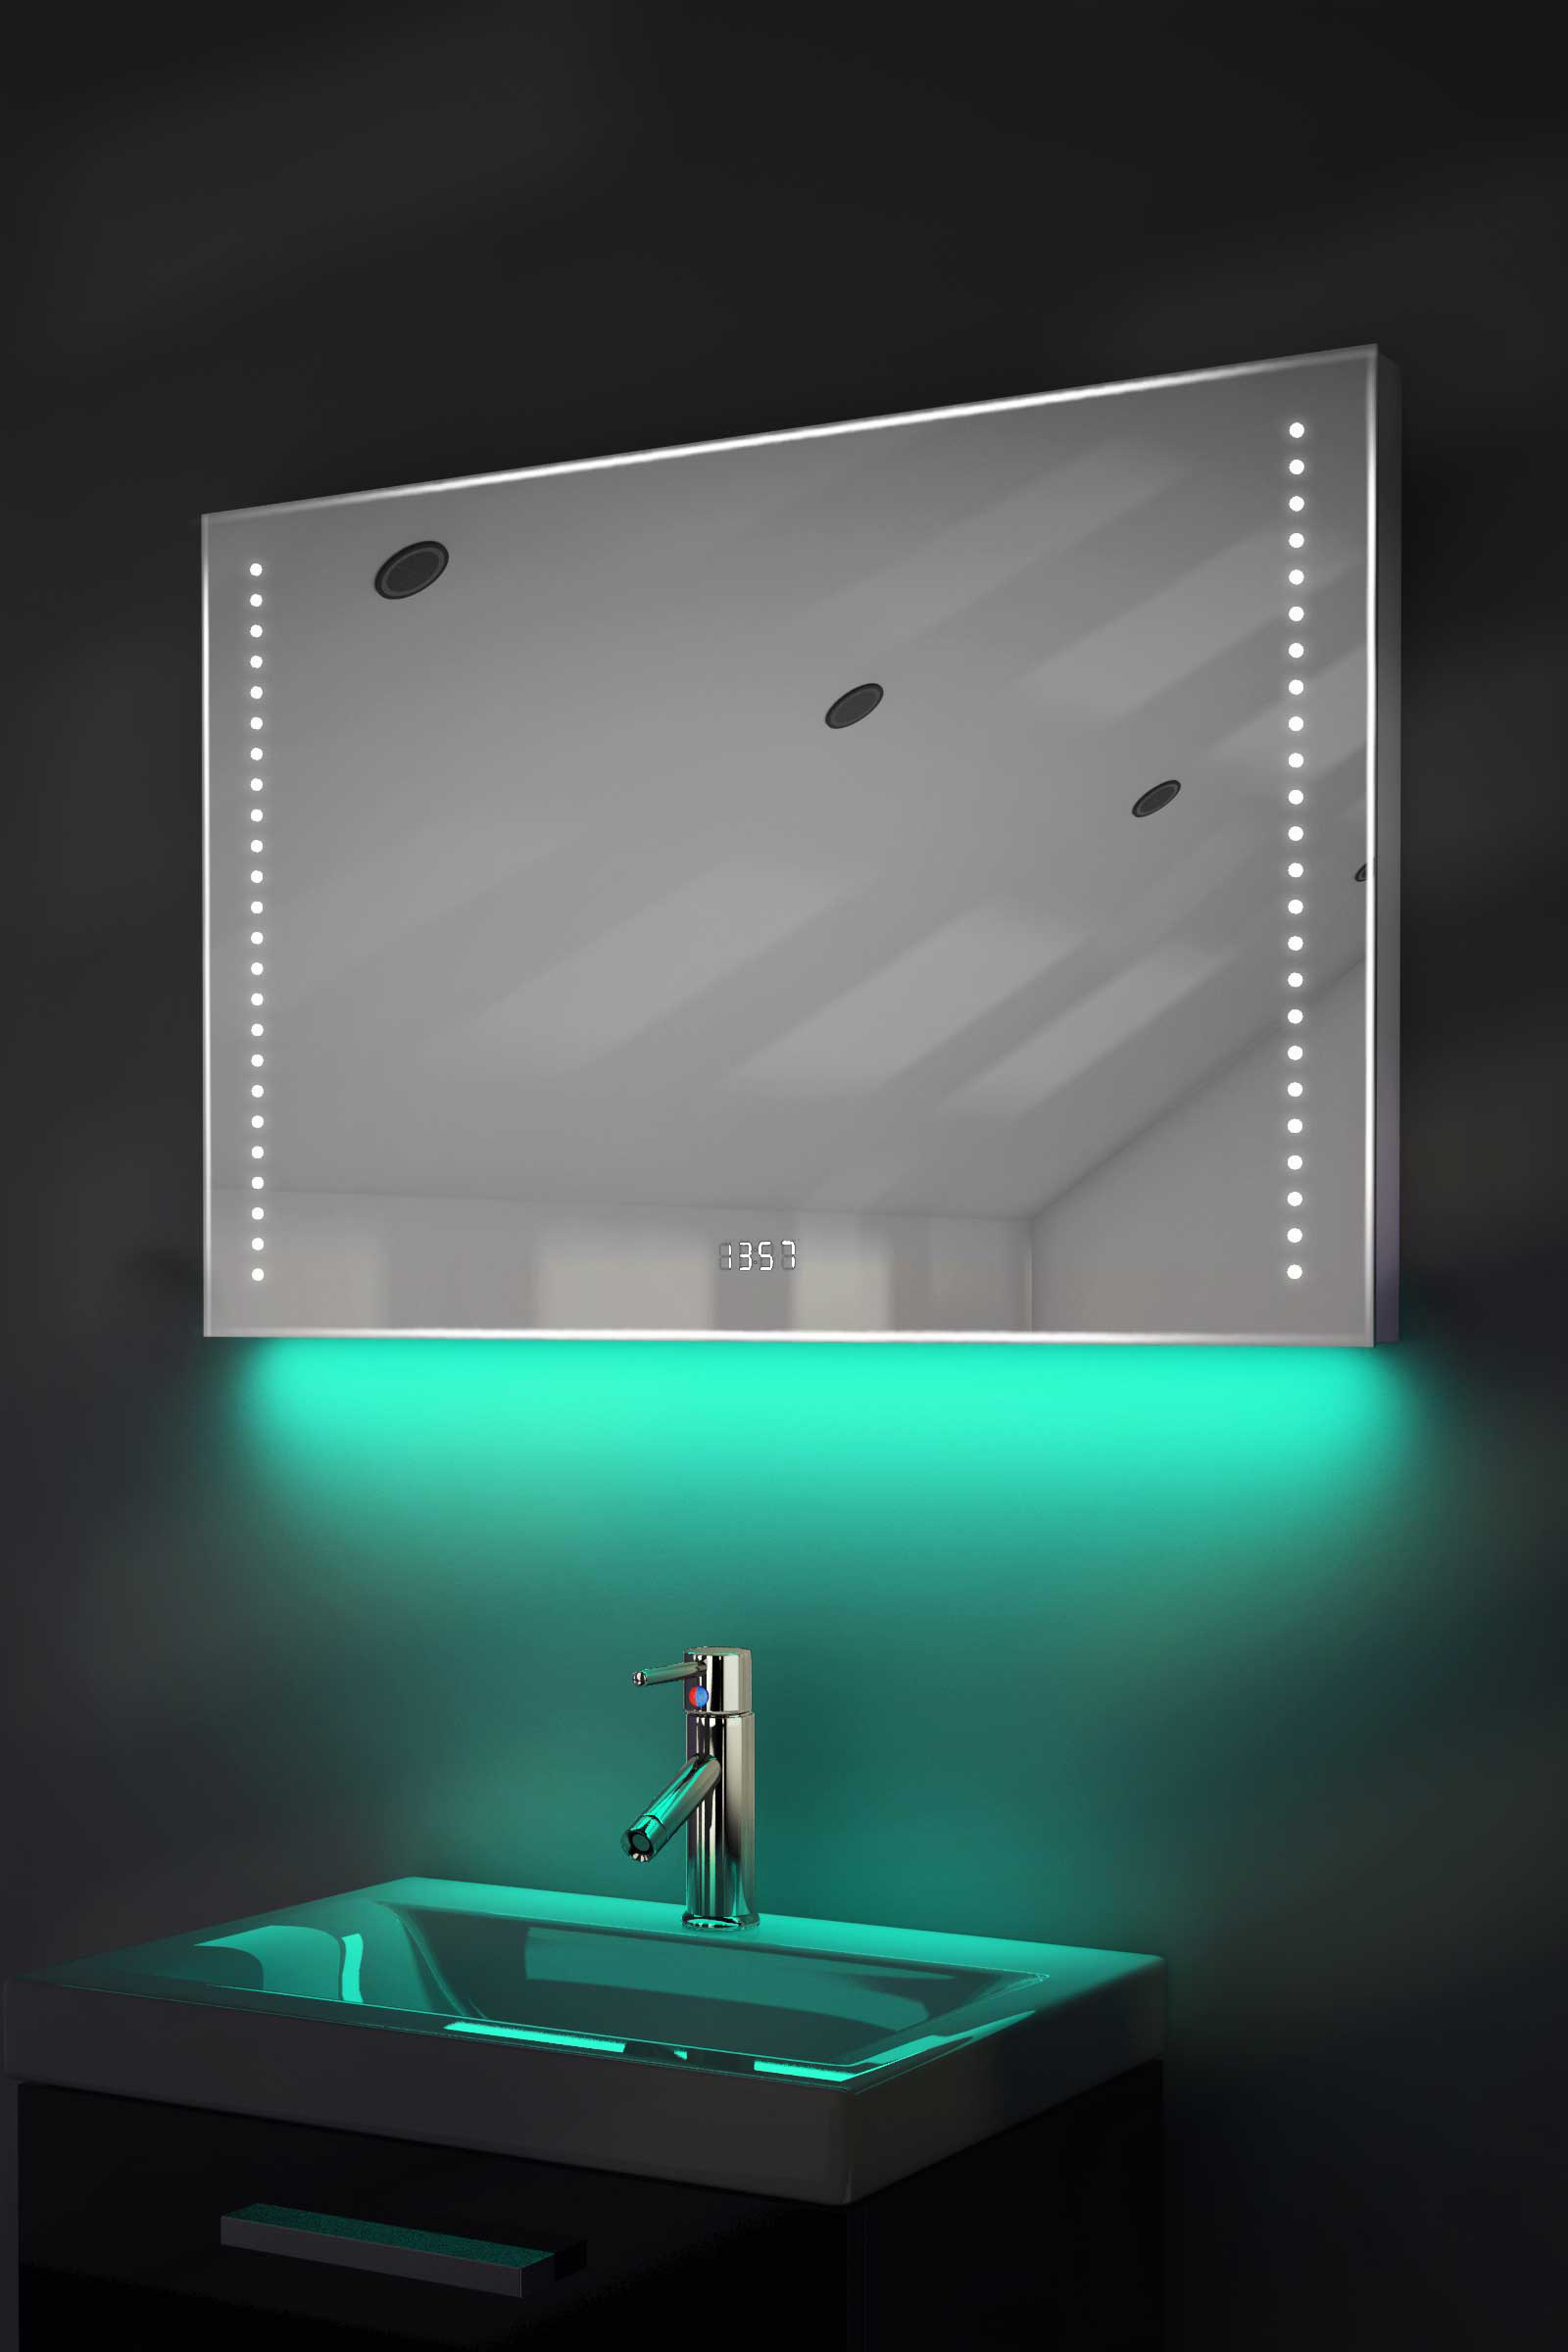 badspiegel mit uhr rgb beleuchtung heizung sensor rasiersteckdose k195rgb ebay. Black Bedroom Furniture Sets. Home Design Ideas